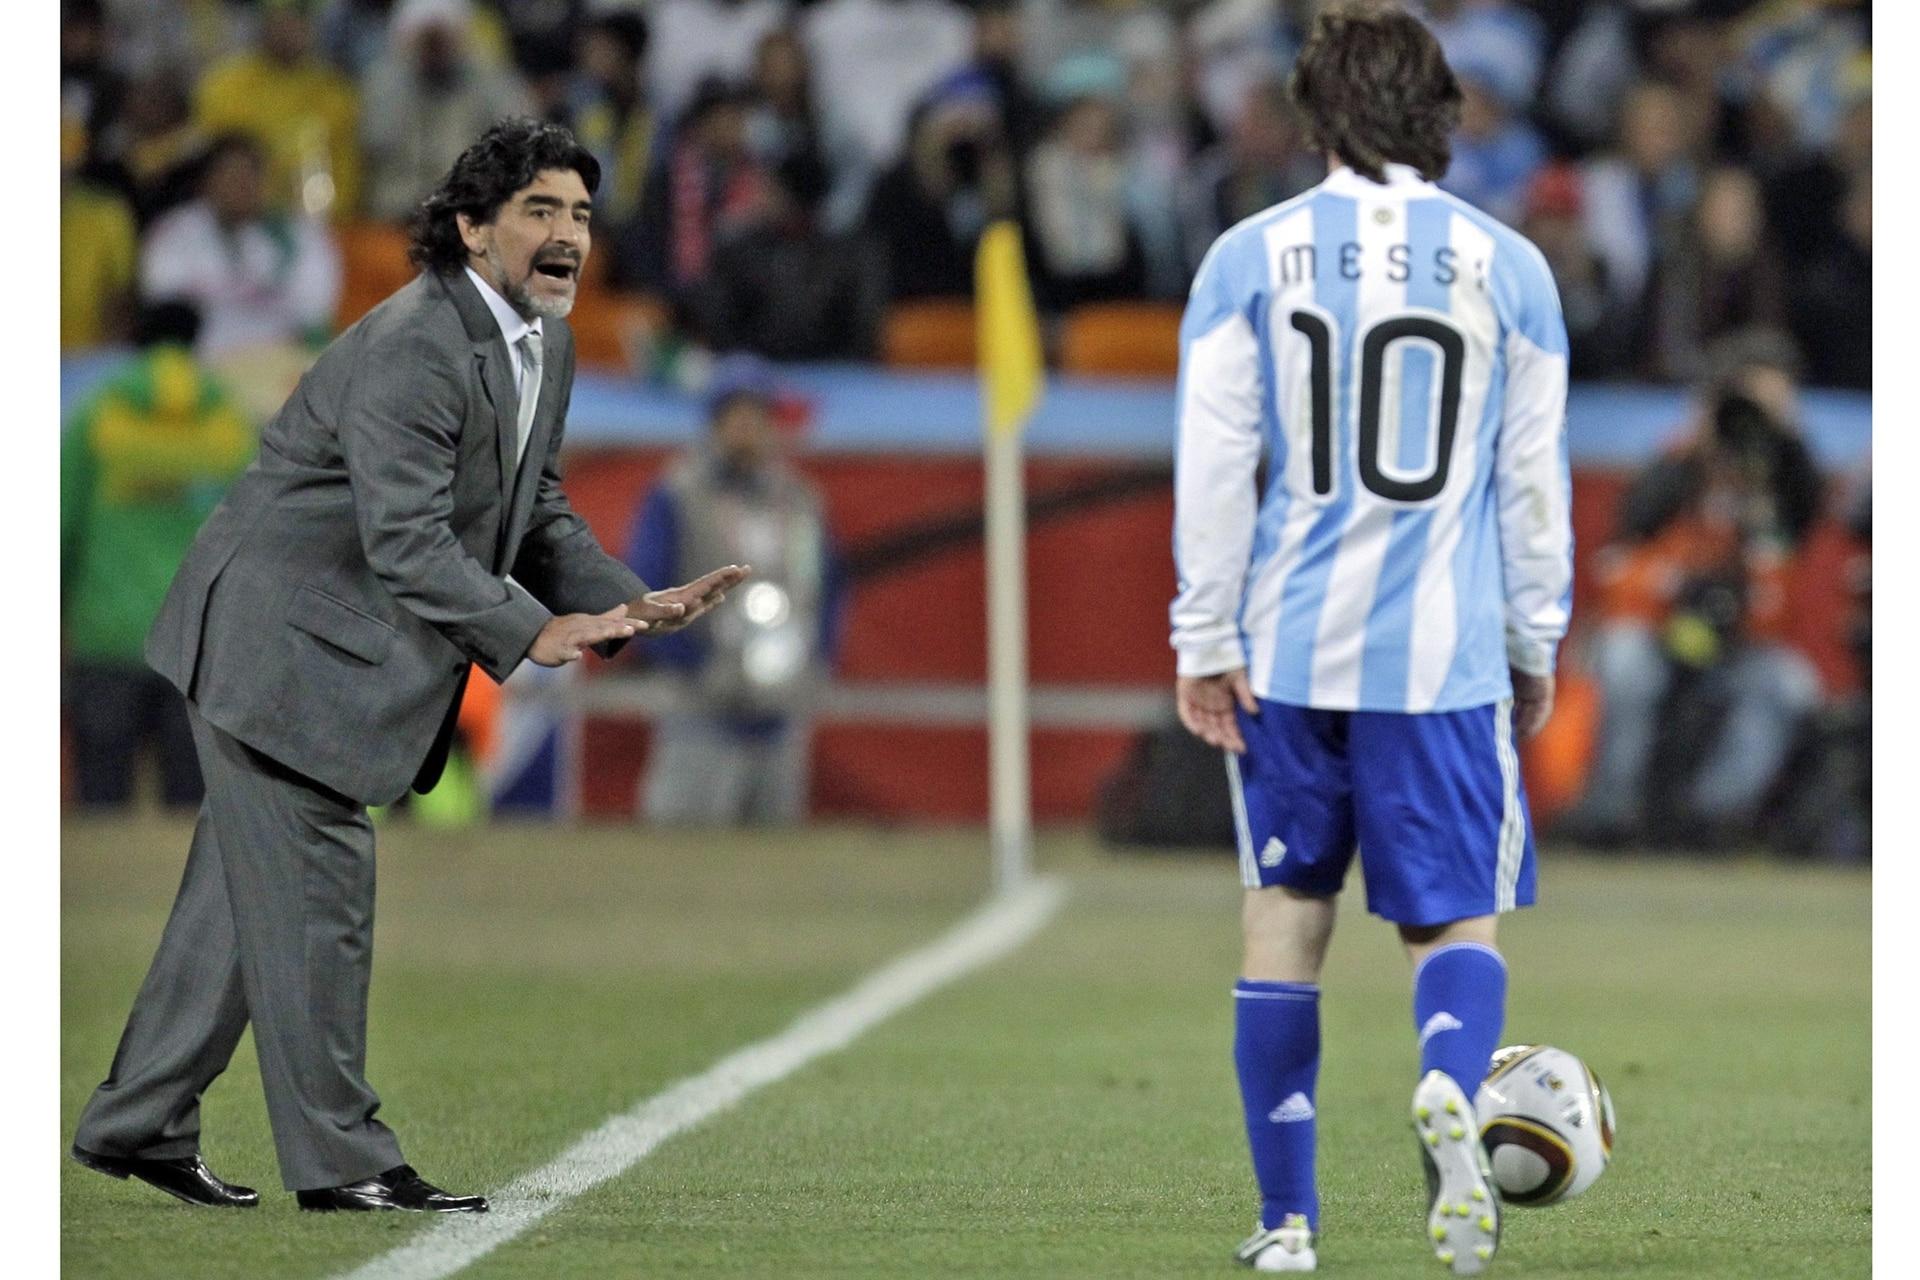 Sudáfrica durante el Mundial 2010 junto a Leo Messi